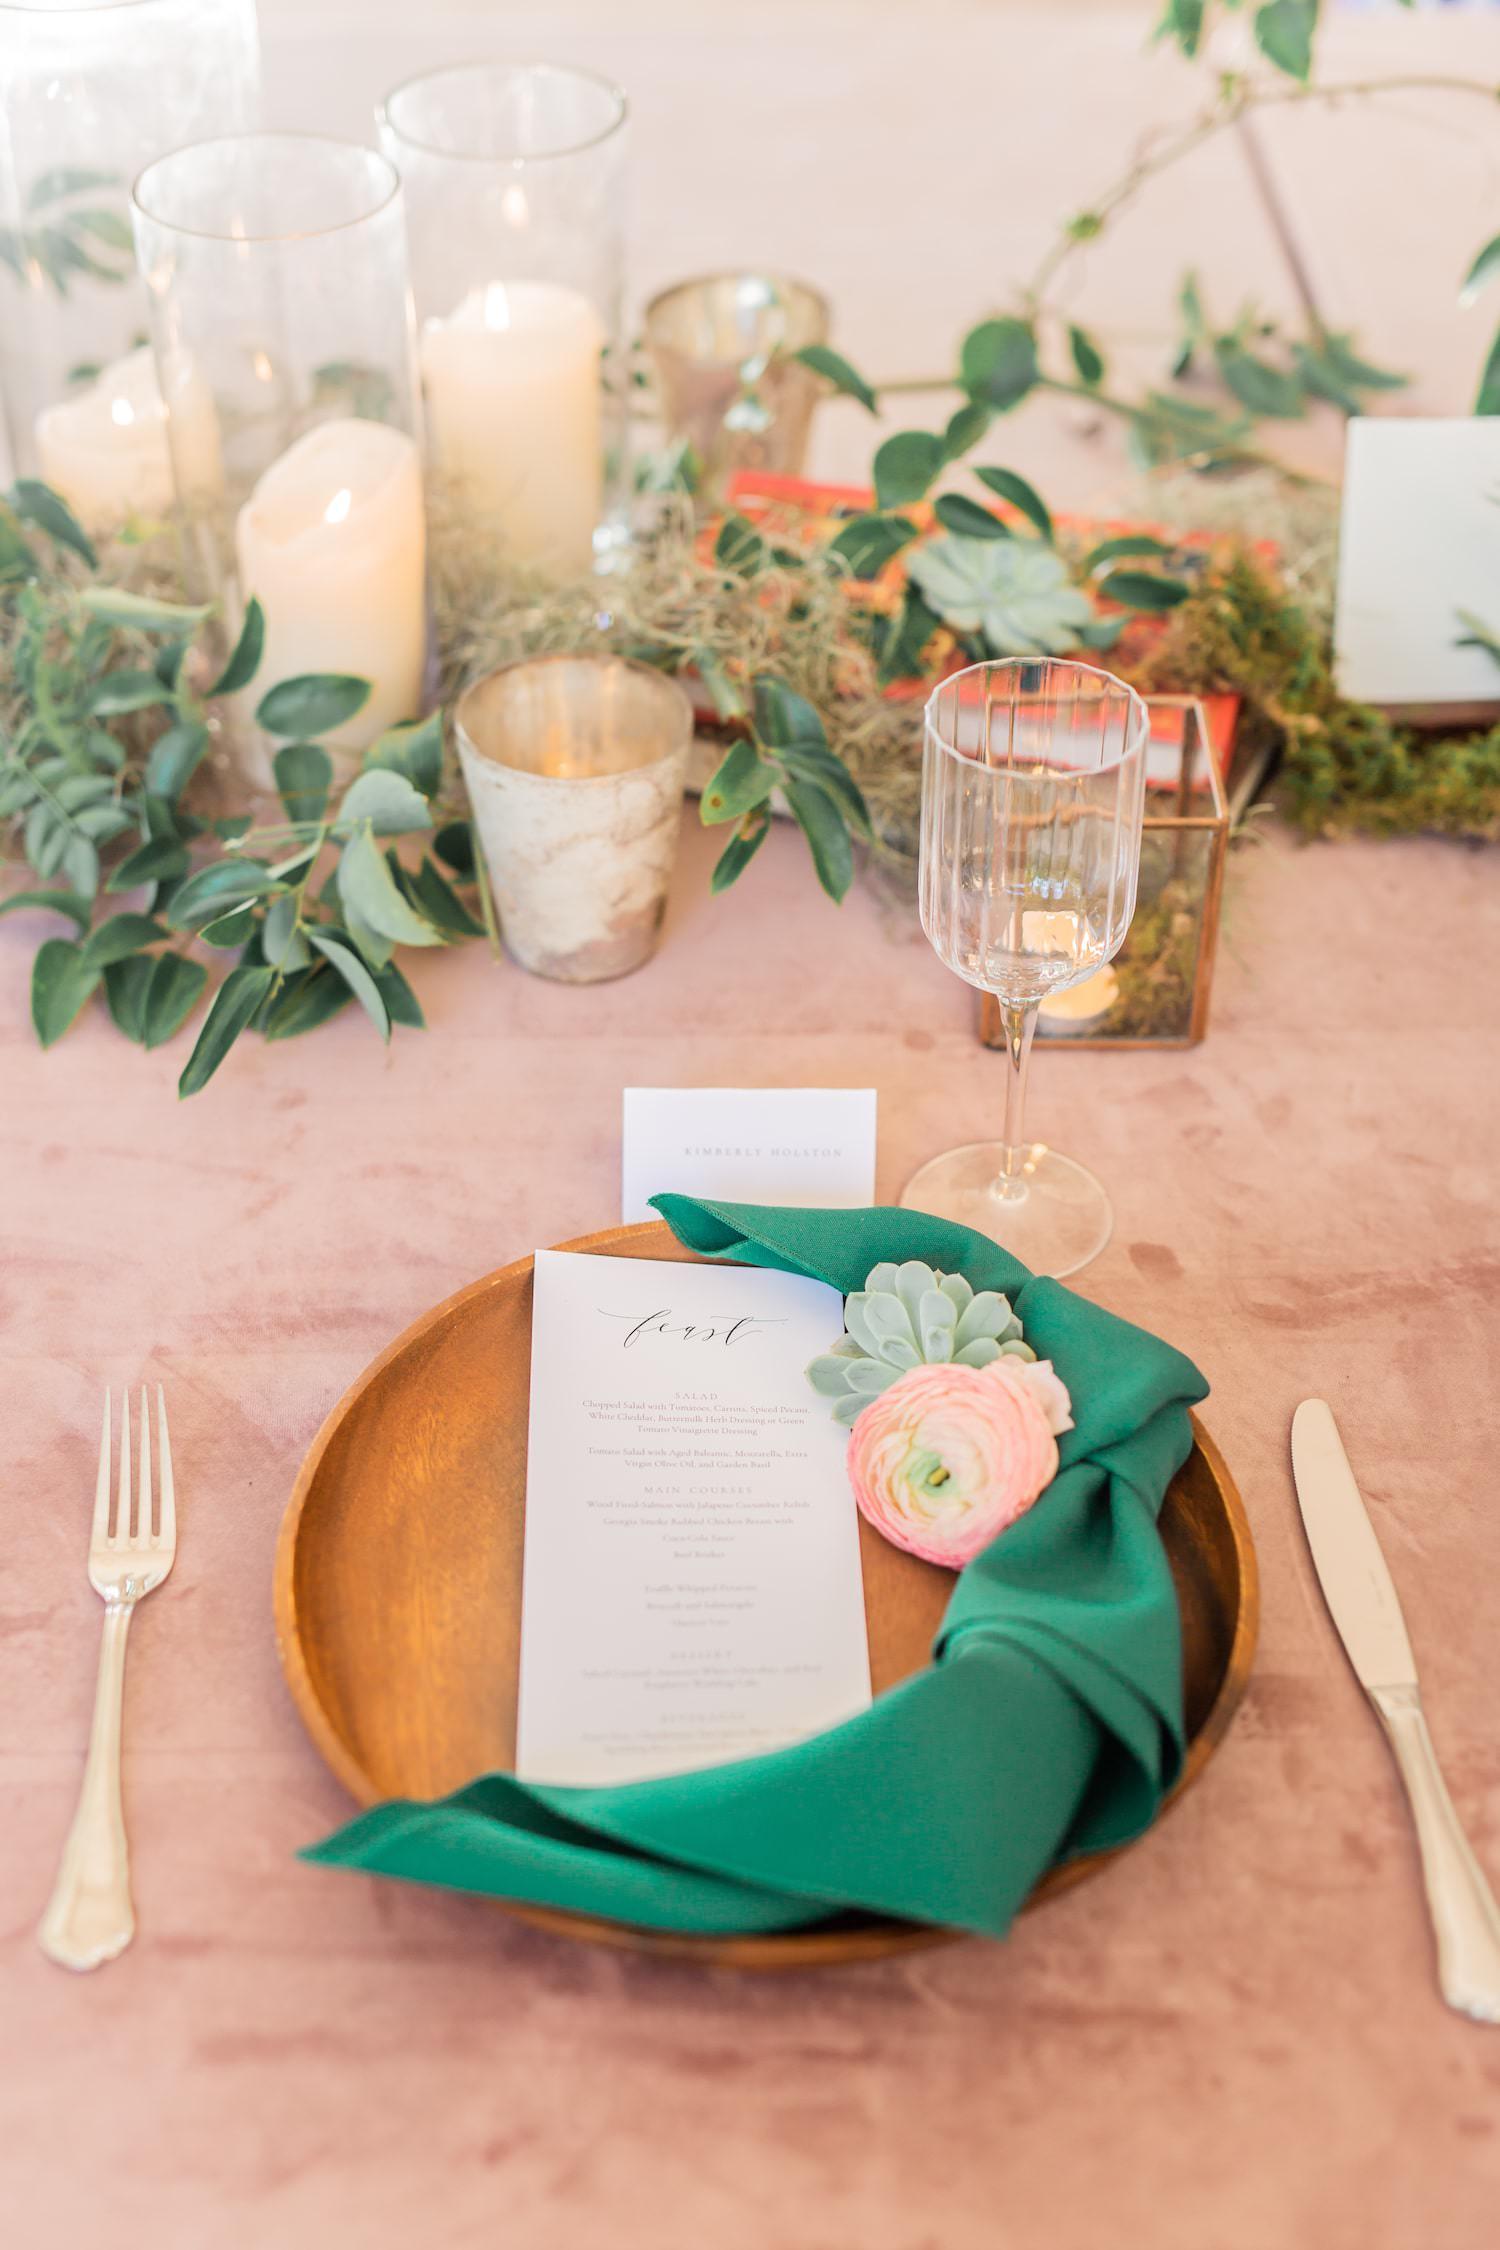 Romantic, fairytale, storybook themed wedding table setting